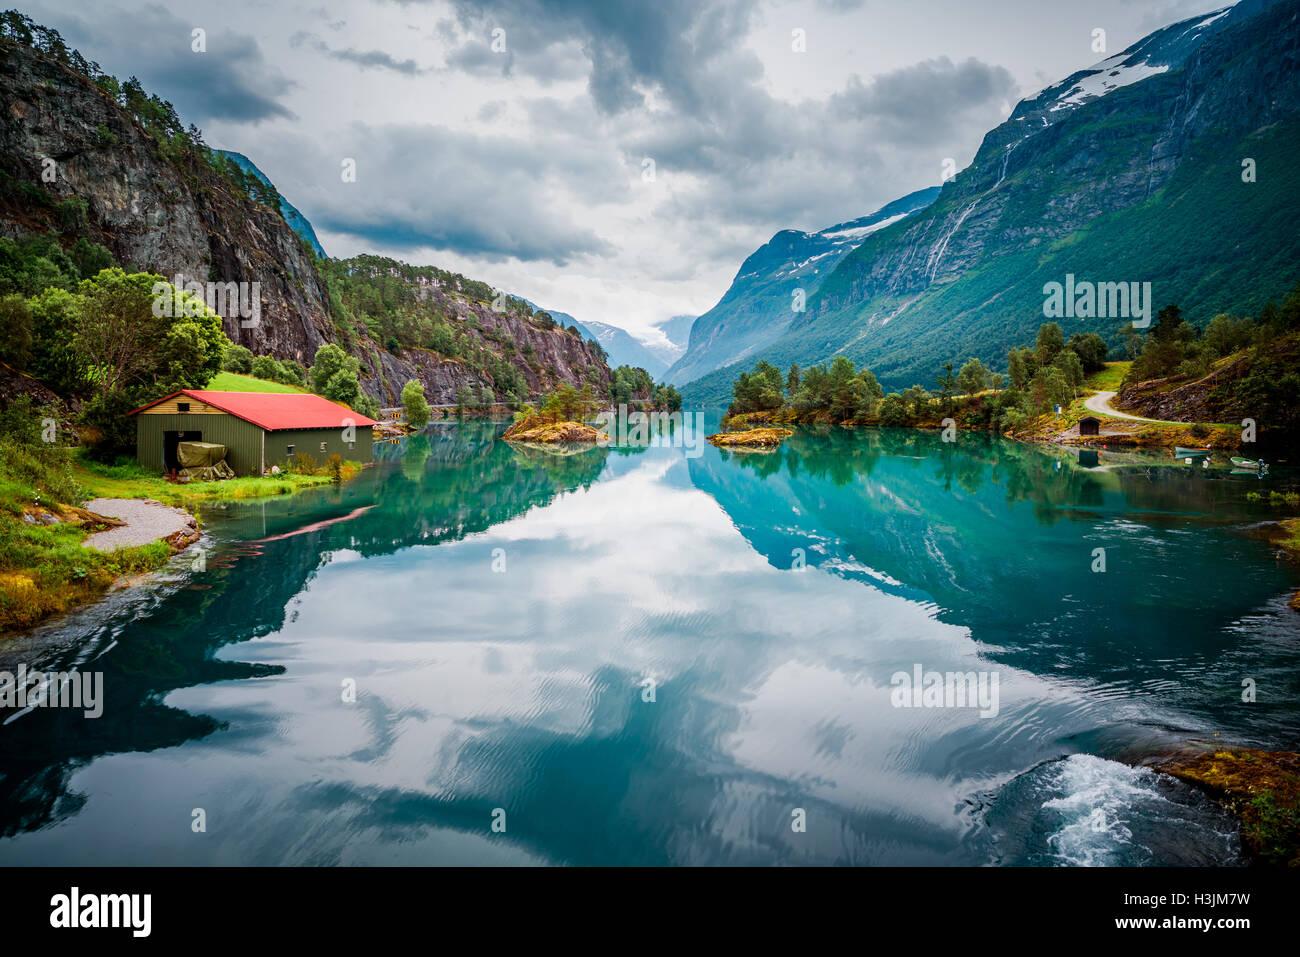 Hermosa naturaleza noruega paisaje natural. Lago lovatnet. Imagen De Stock